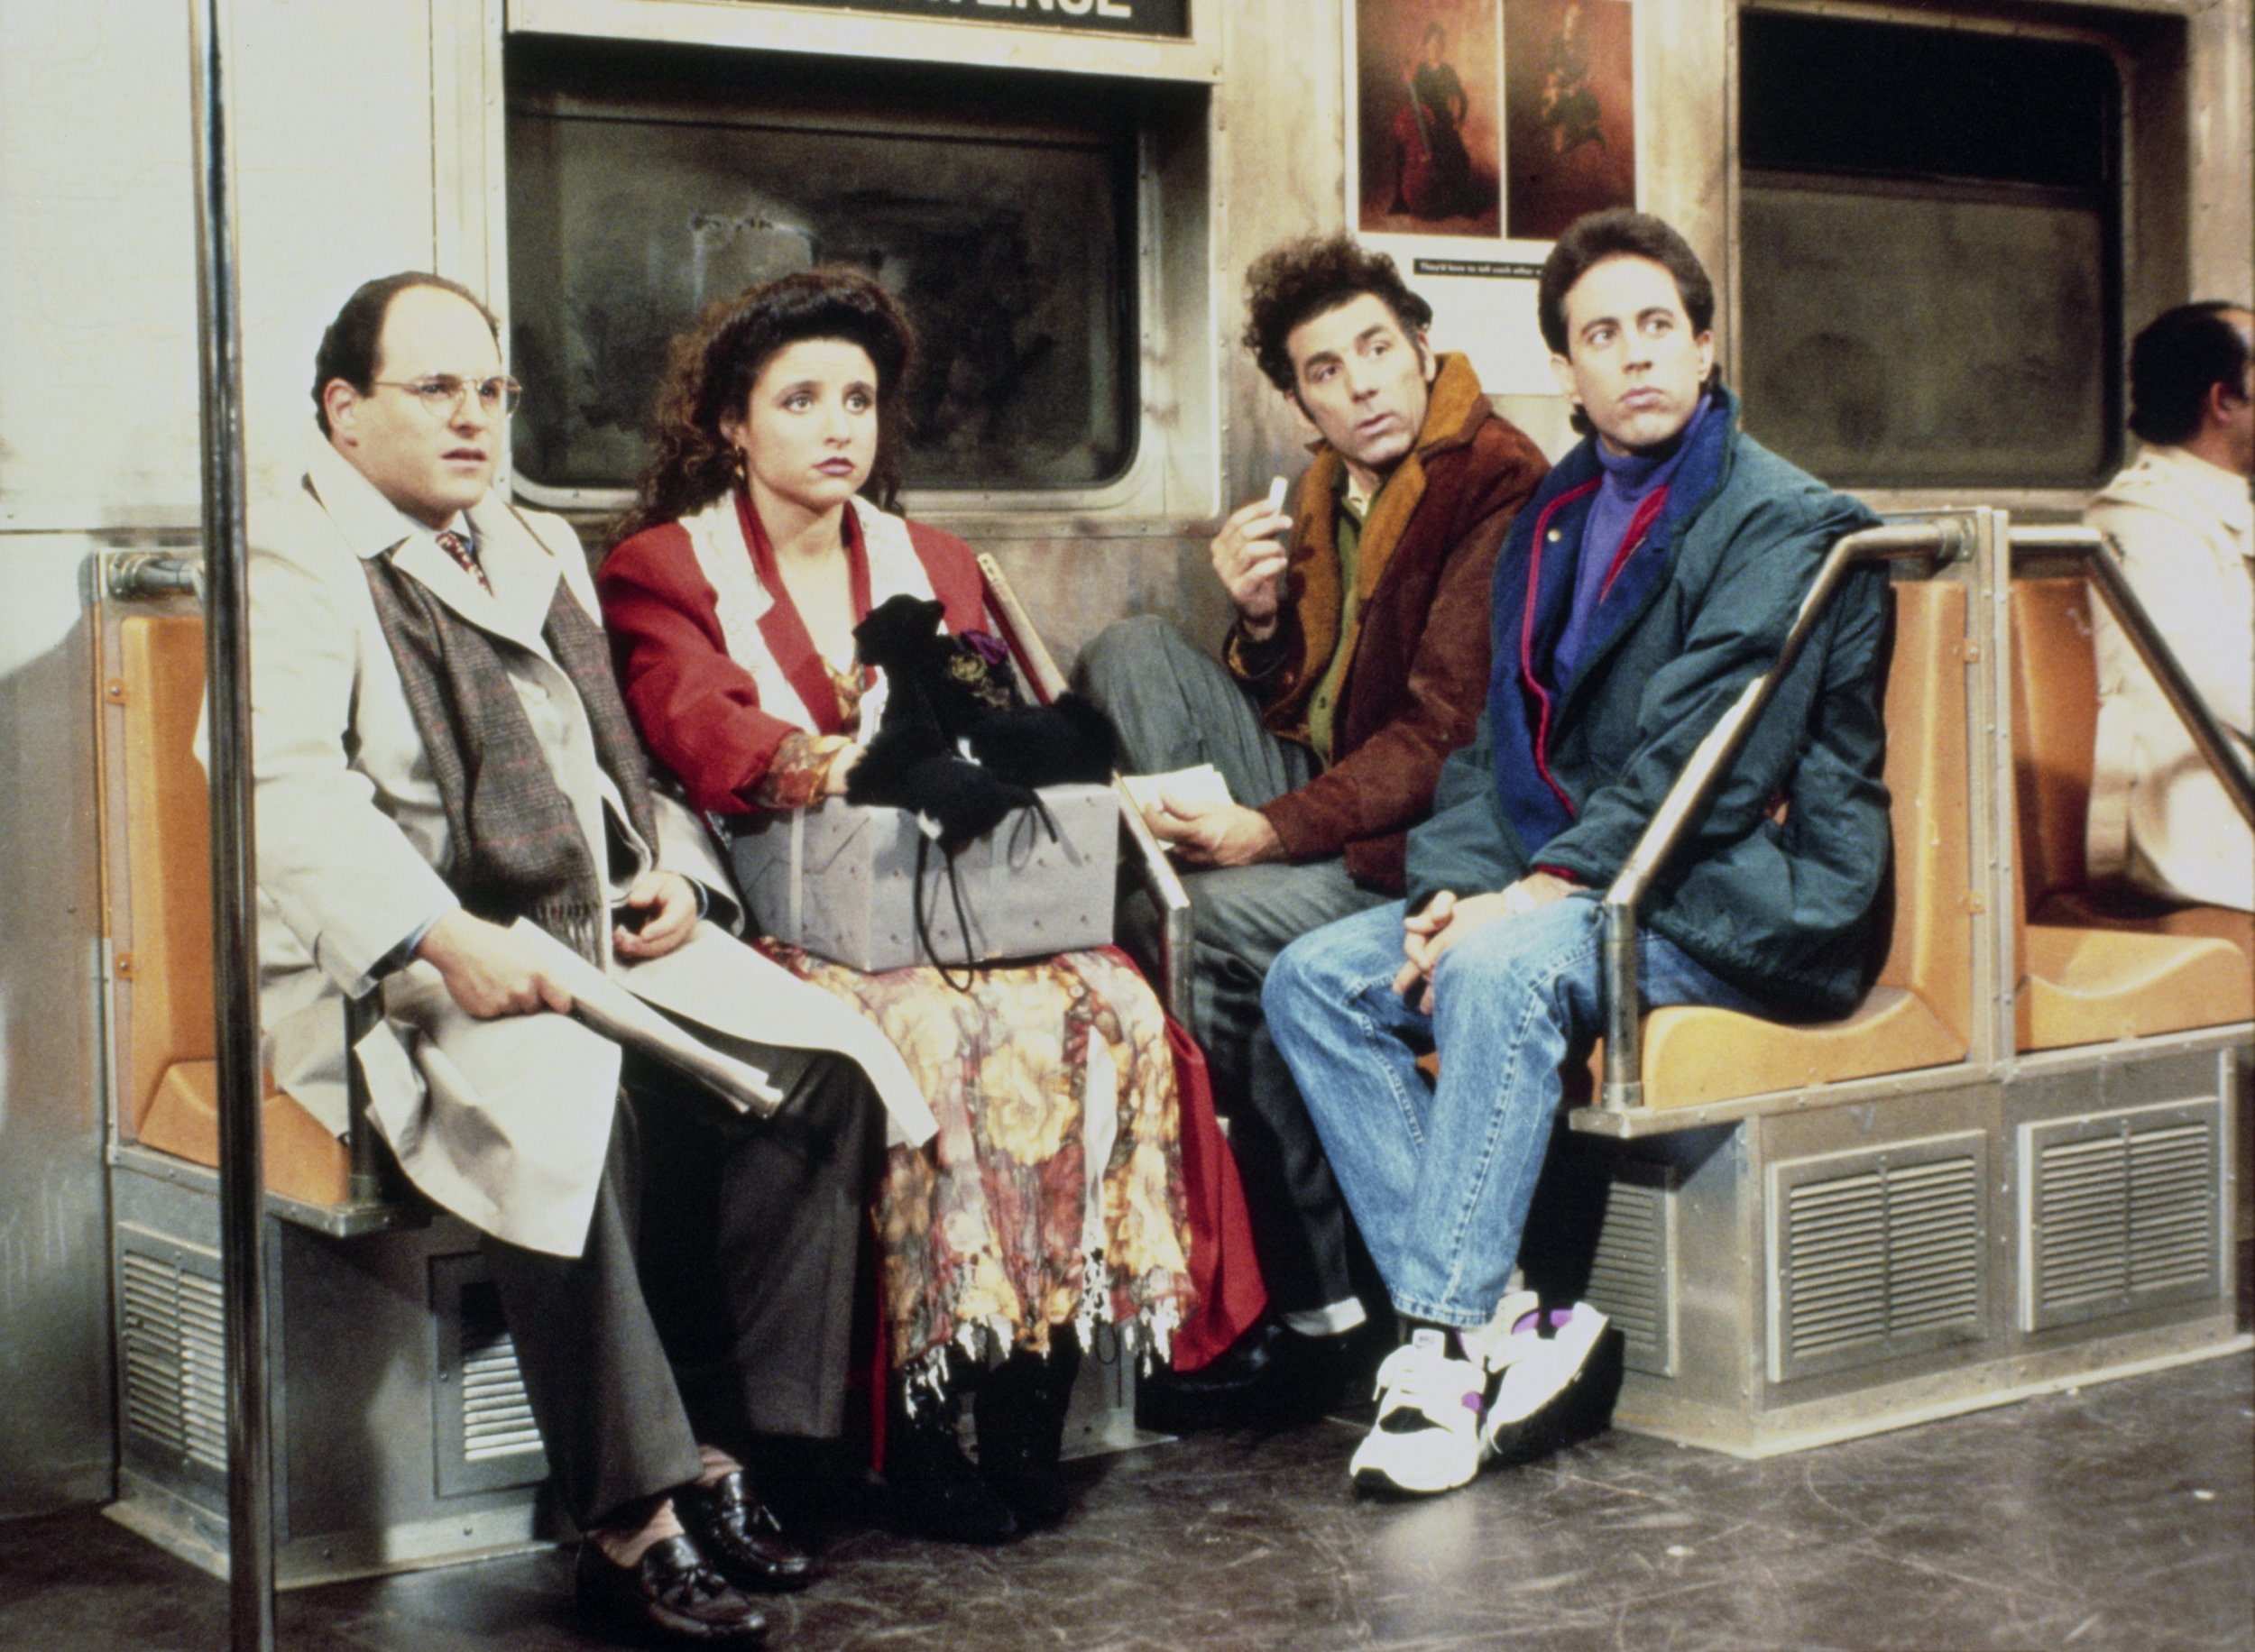 09_09_Seinfeld_01